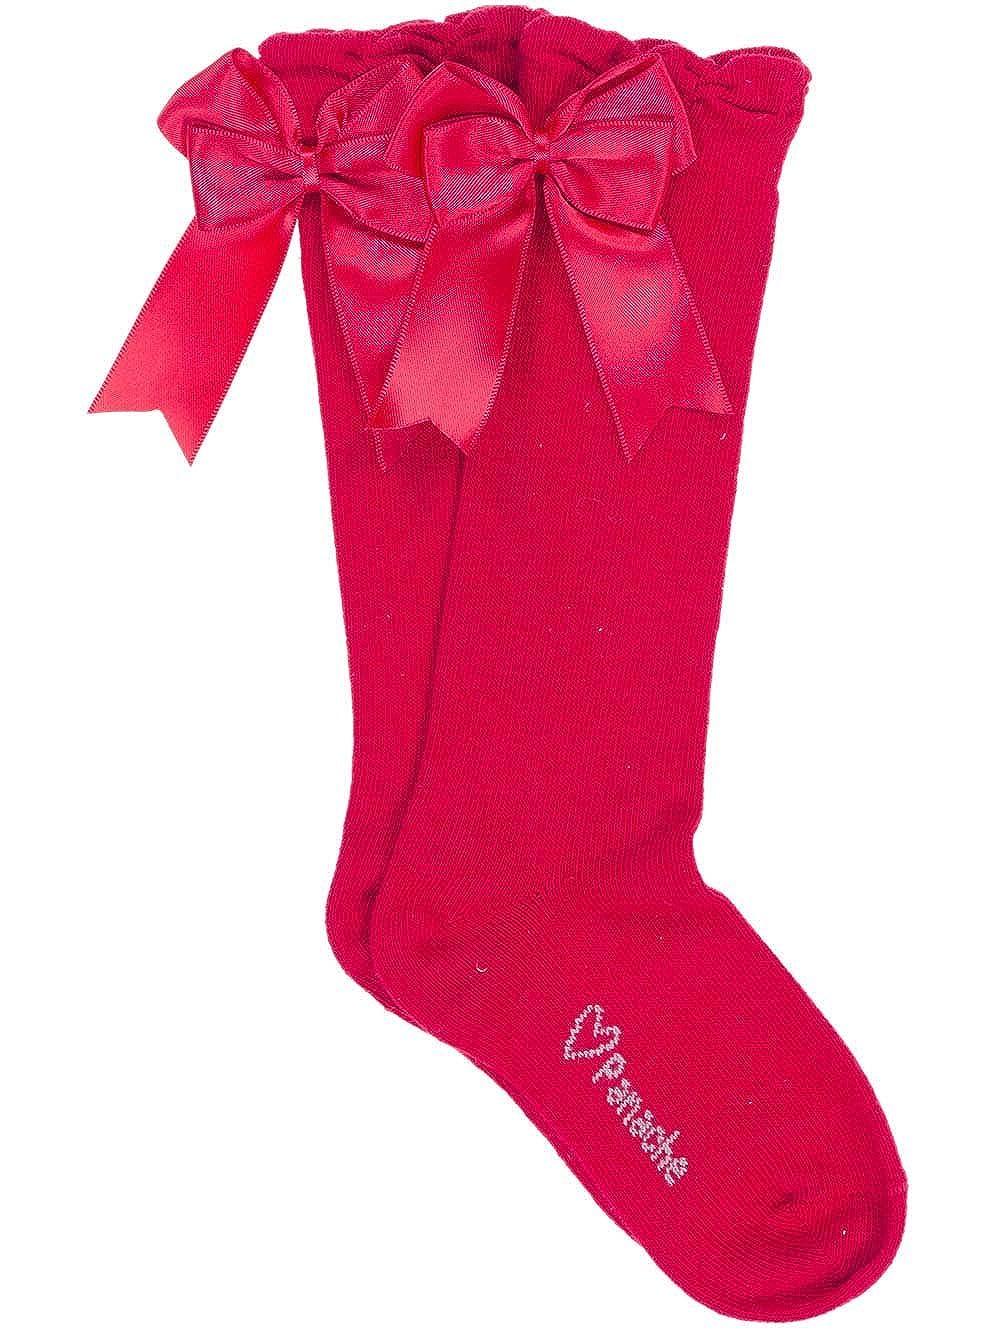 Carlomagno Socks Large Double Back Satin Bow